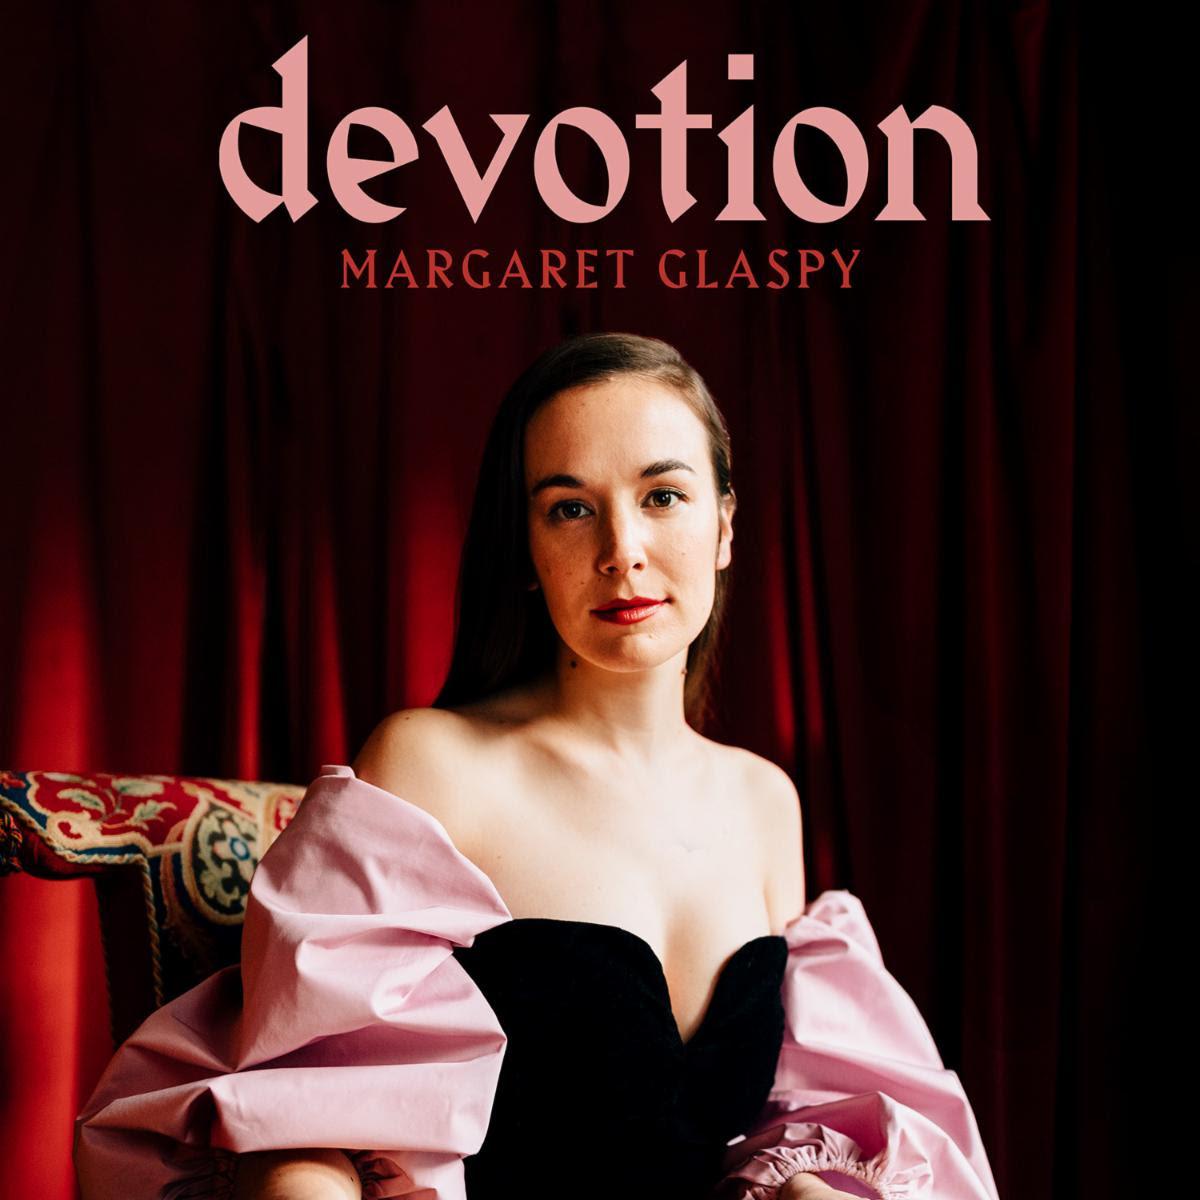 Margaret Glaspy devotion album cover artwork